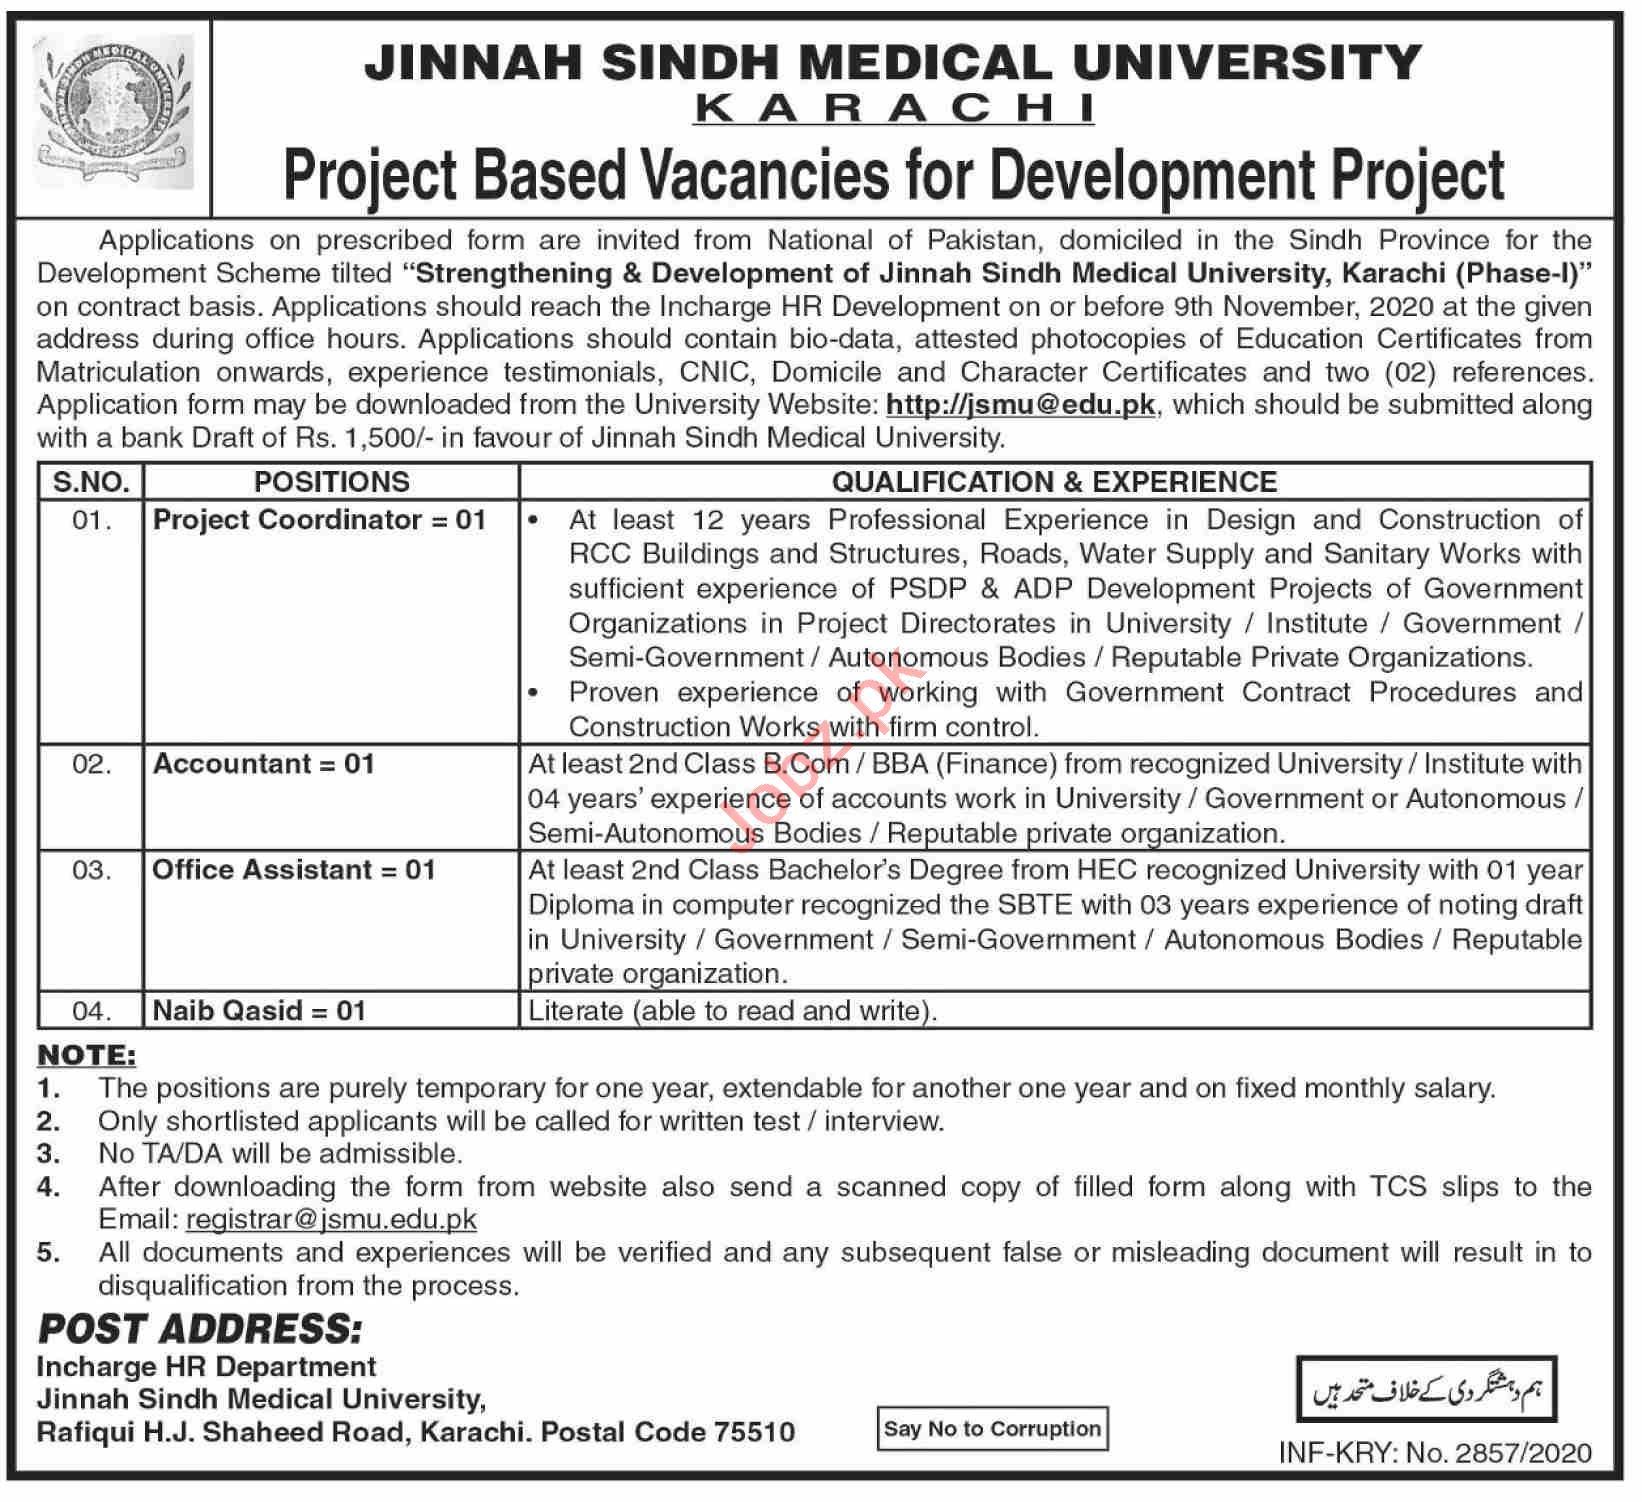 Jinnah Sindh Medical University JSMU Jobs for Coordinator